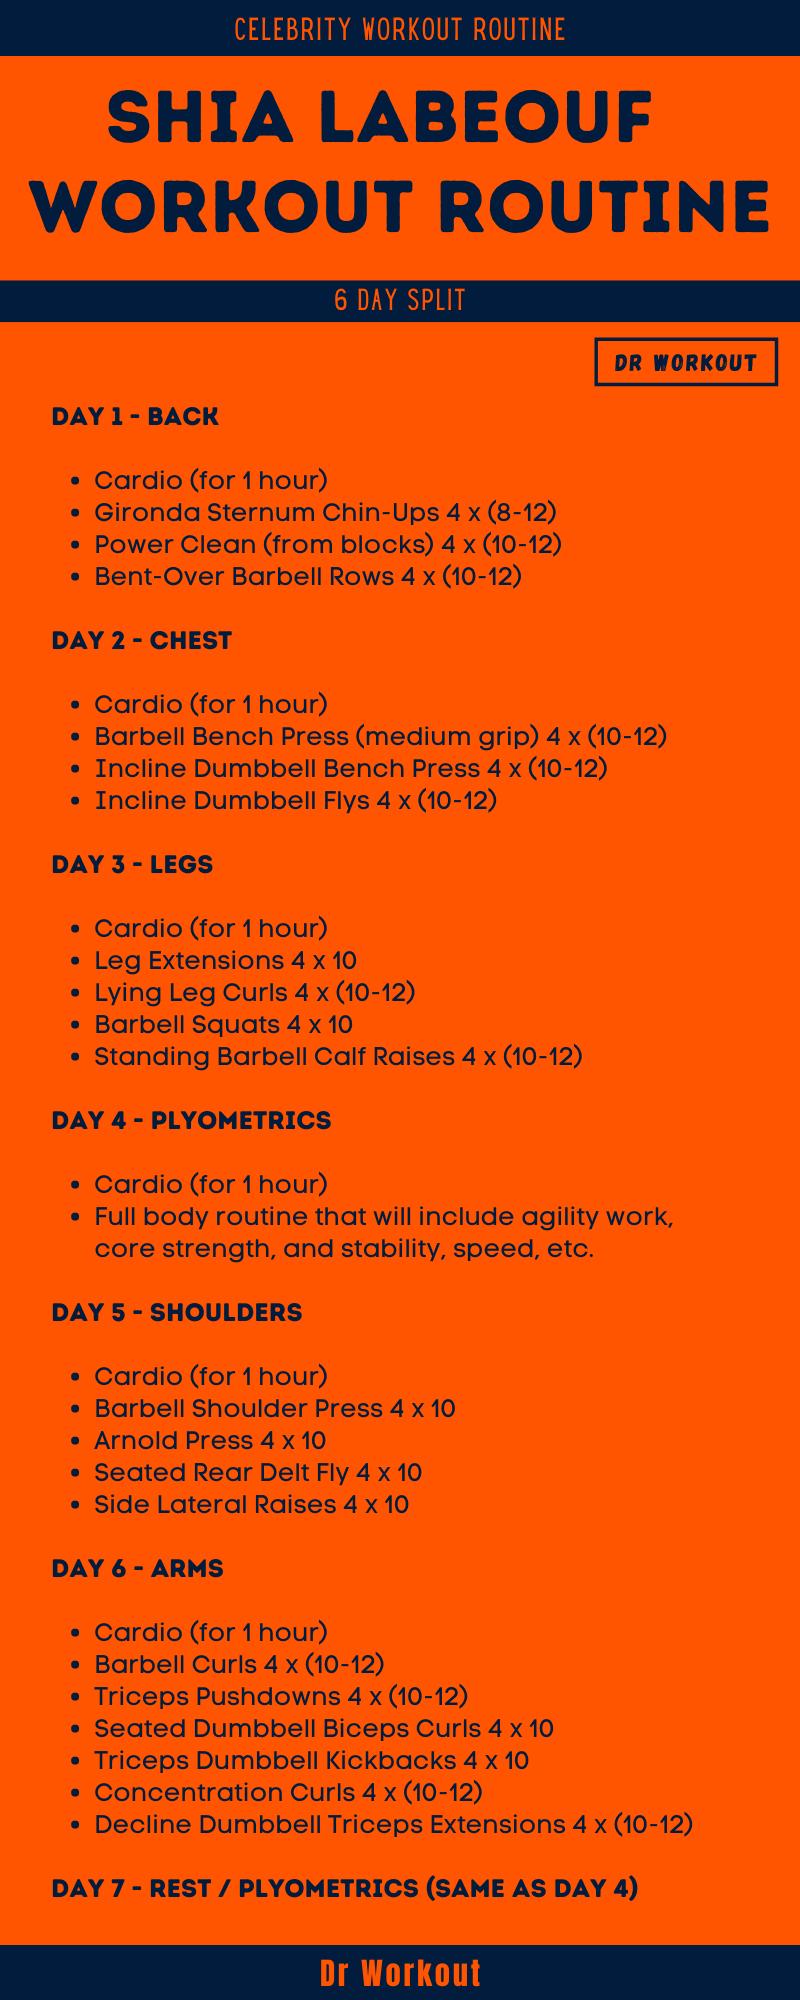 Shia LaBeouf Workout Routine